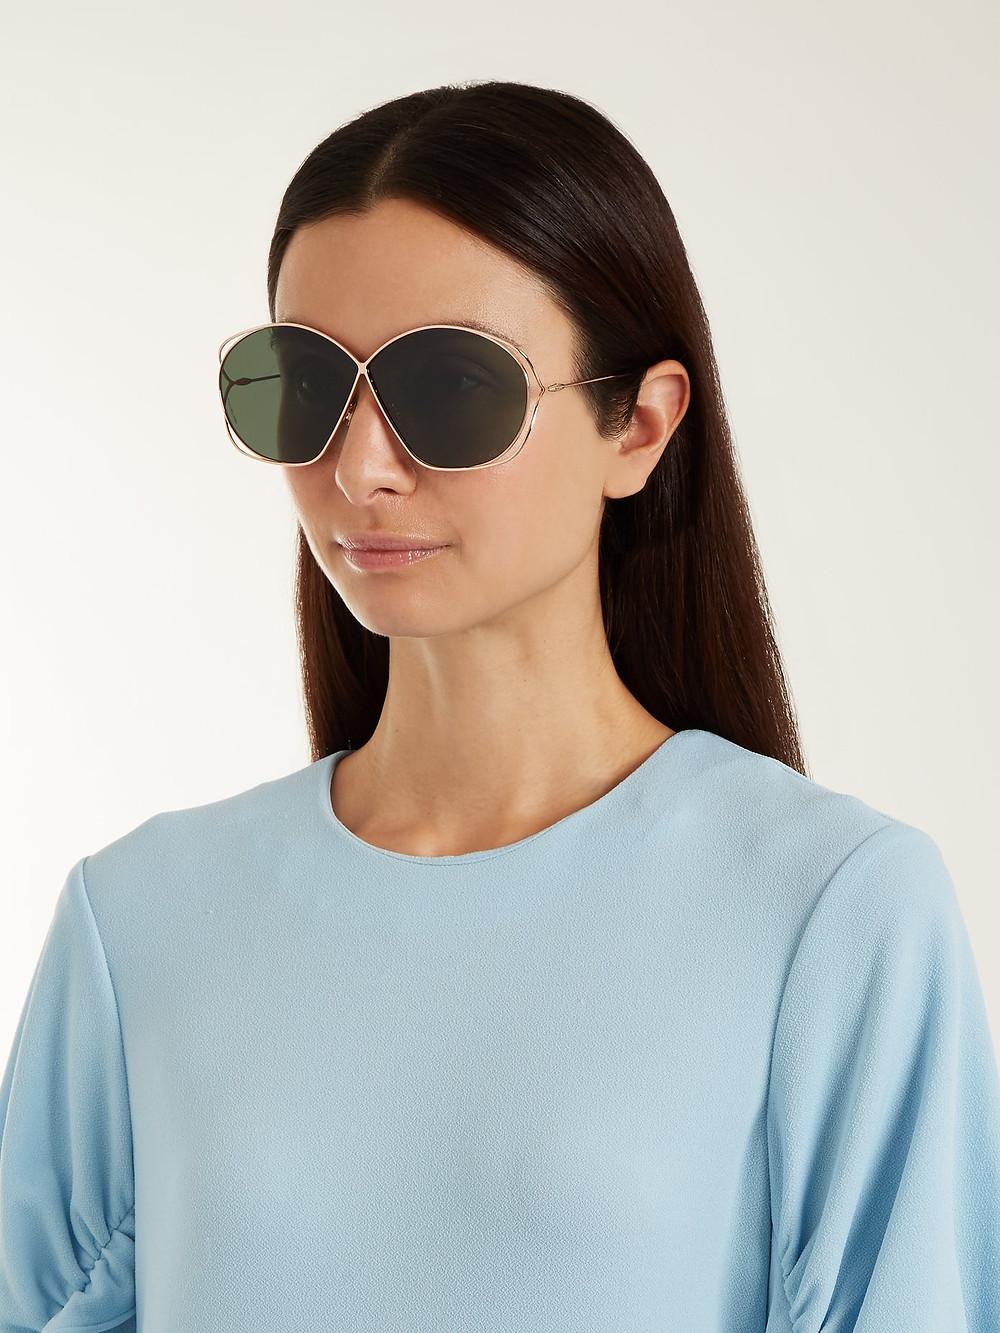 Dior Stellaire2 oversized metal sunglasses $360